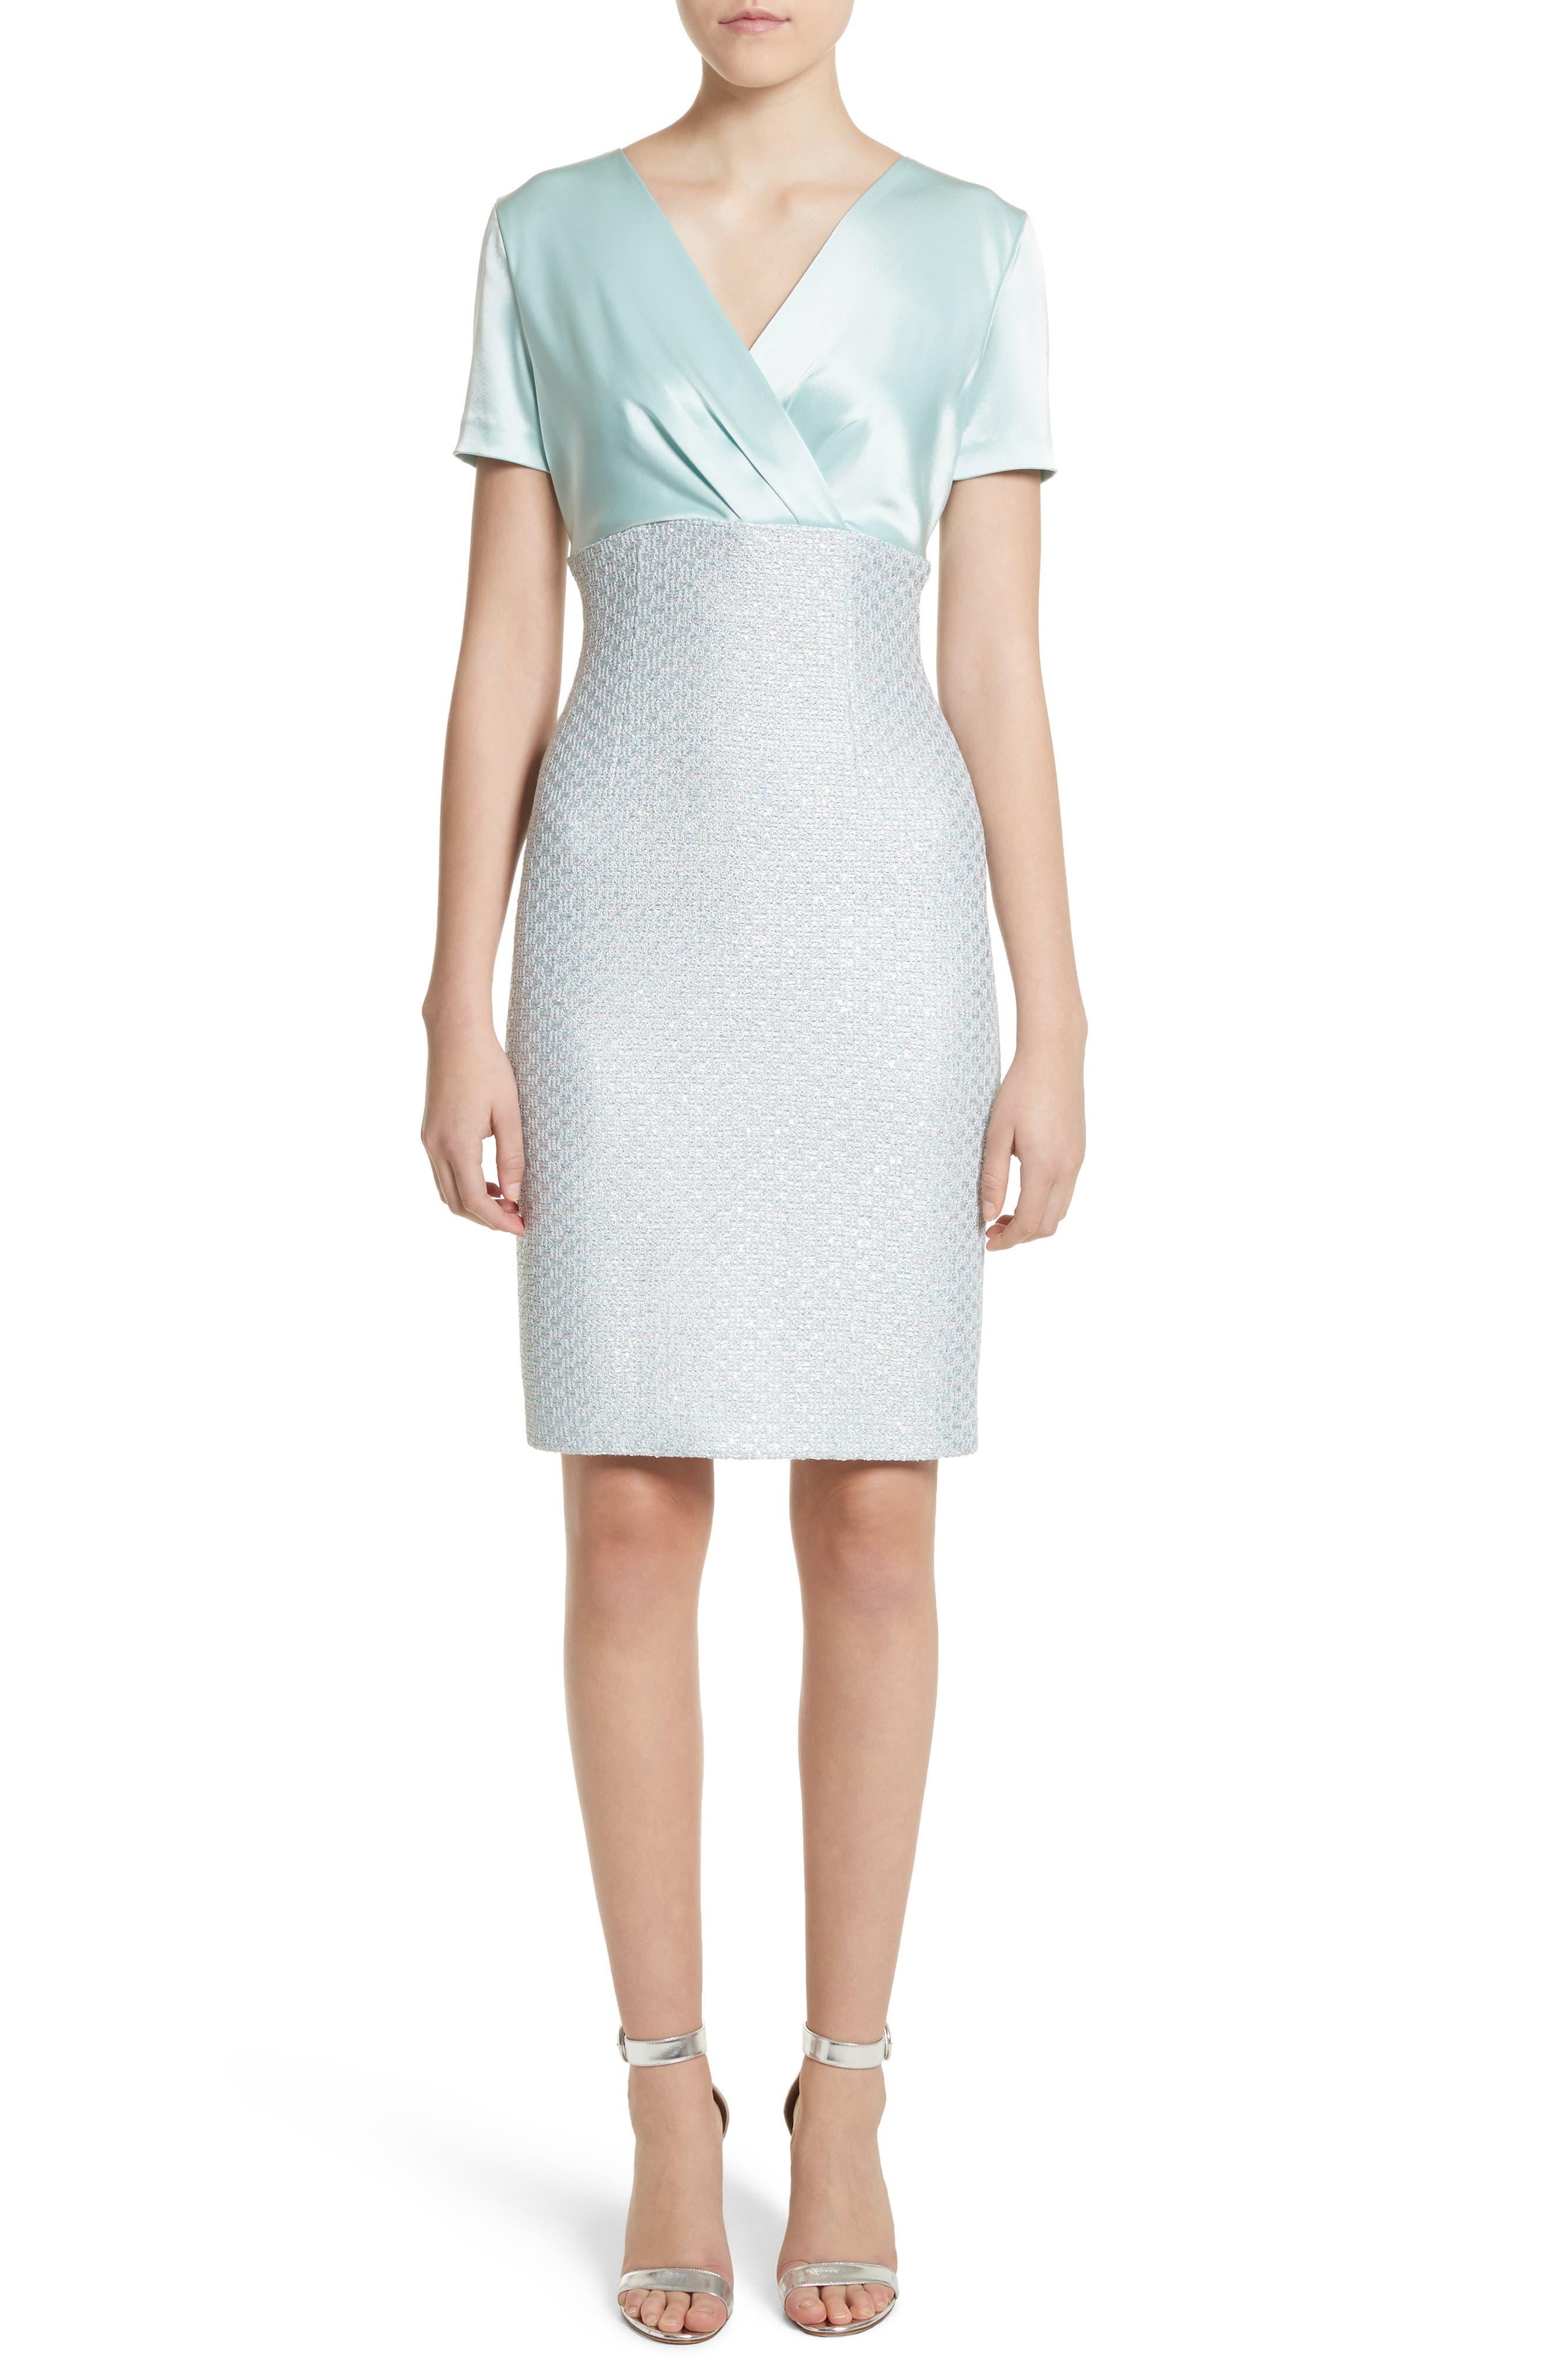 Hansh Satin & Knit Sheath Dress,                             Main thumbnail 1, color,                             440